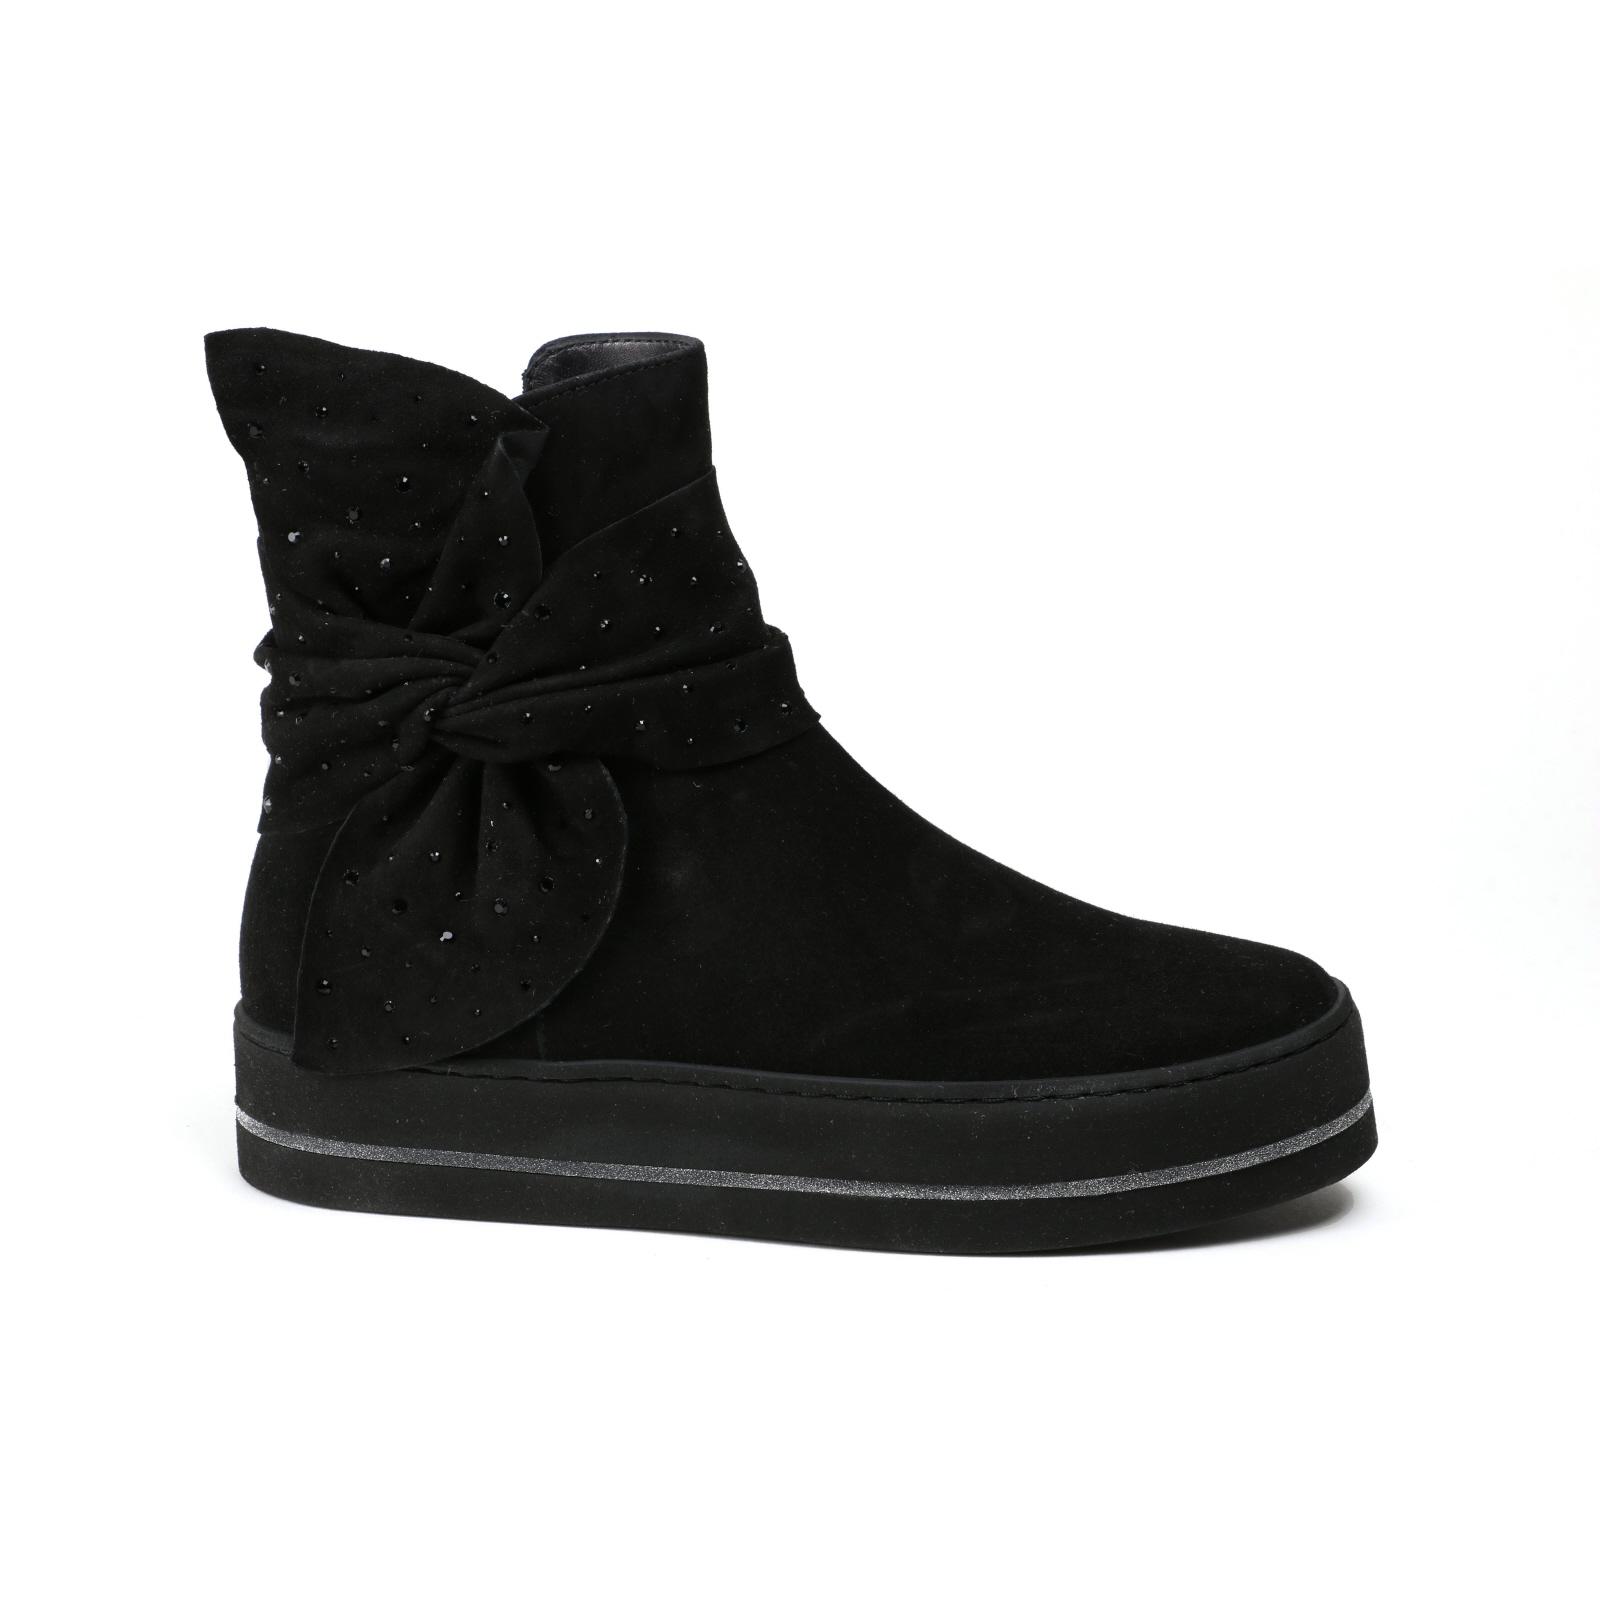 Señora botín nuevo Maripe 'mode negro velourleder nuevo botín talla 39,5 40e893